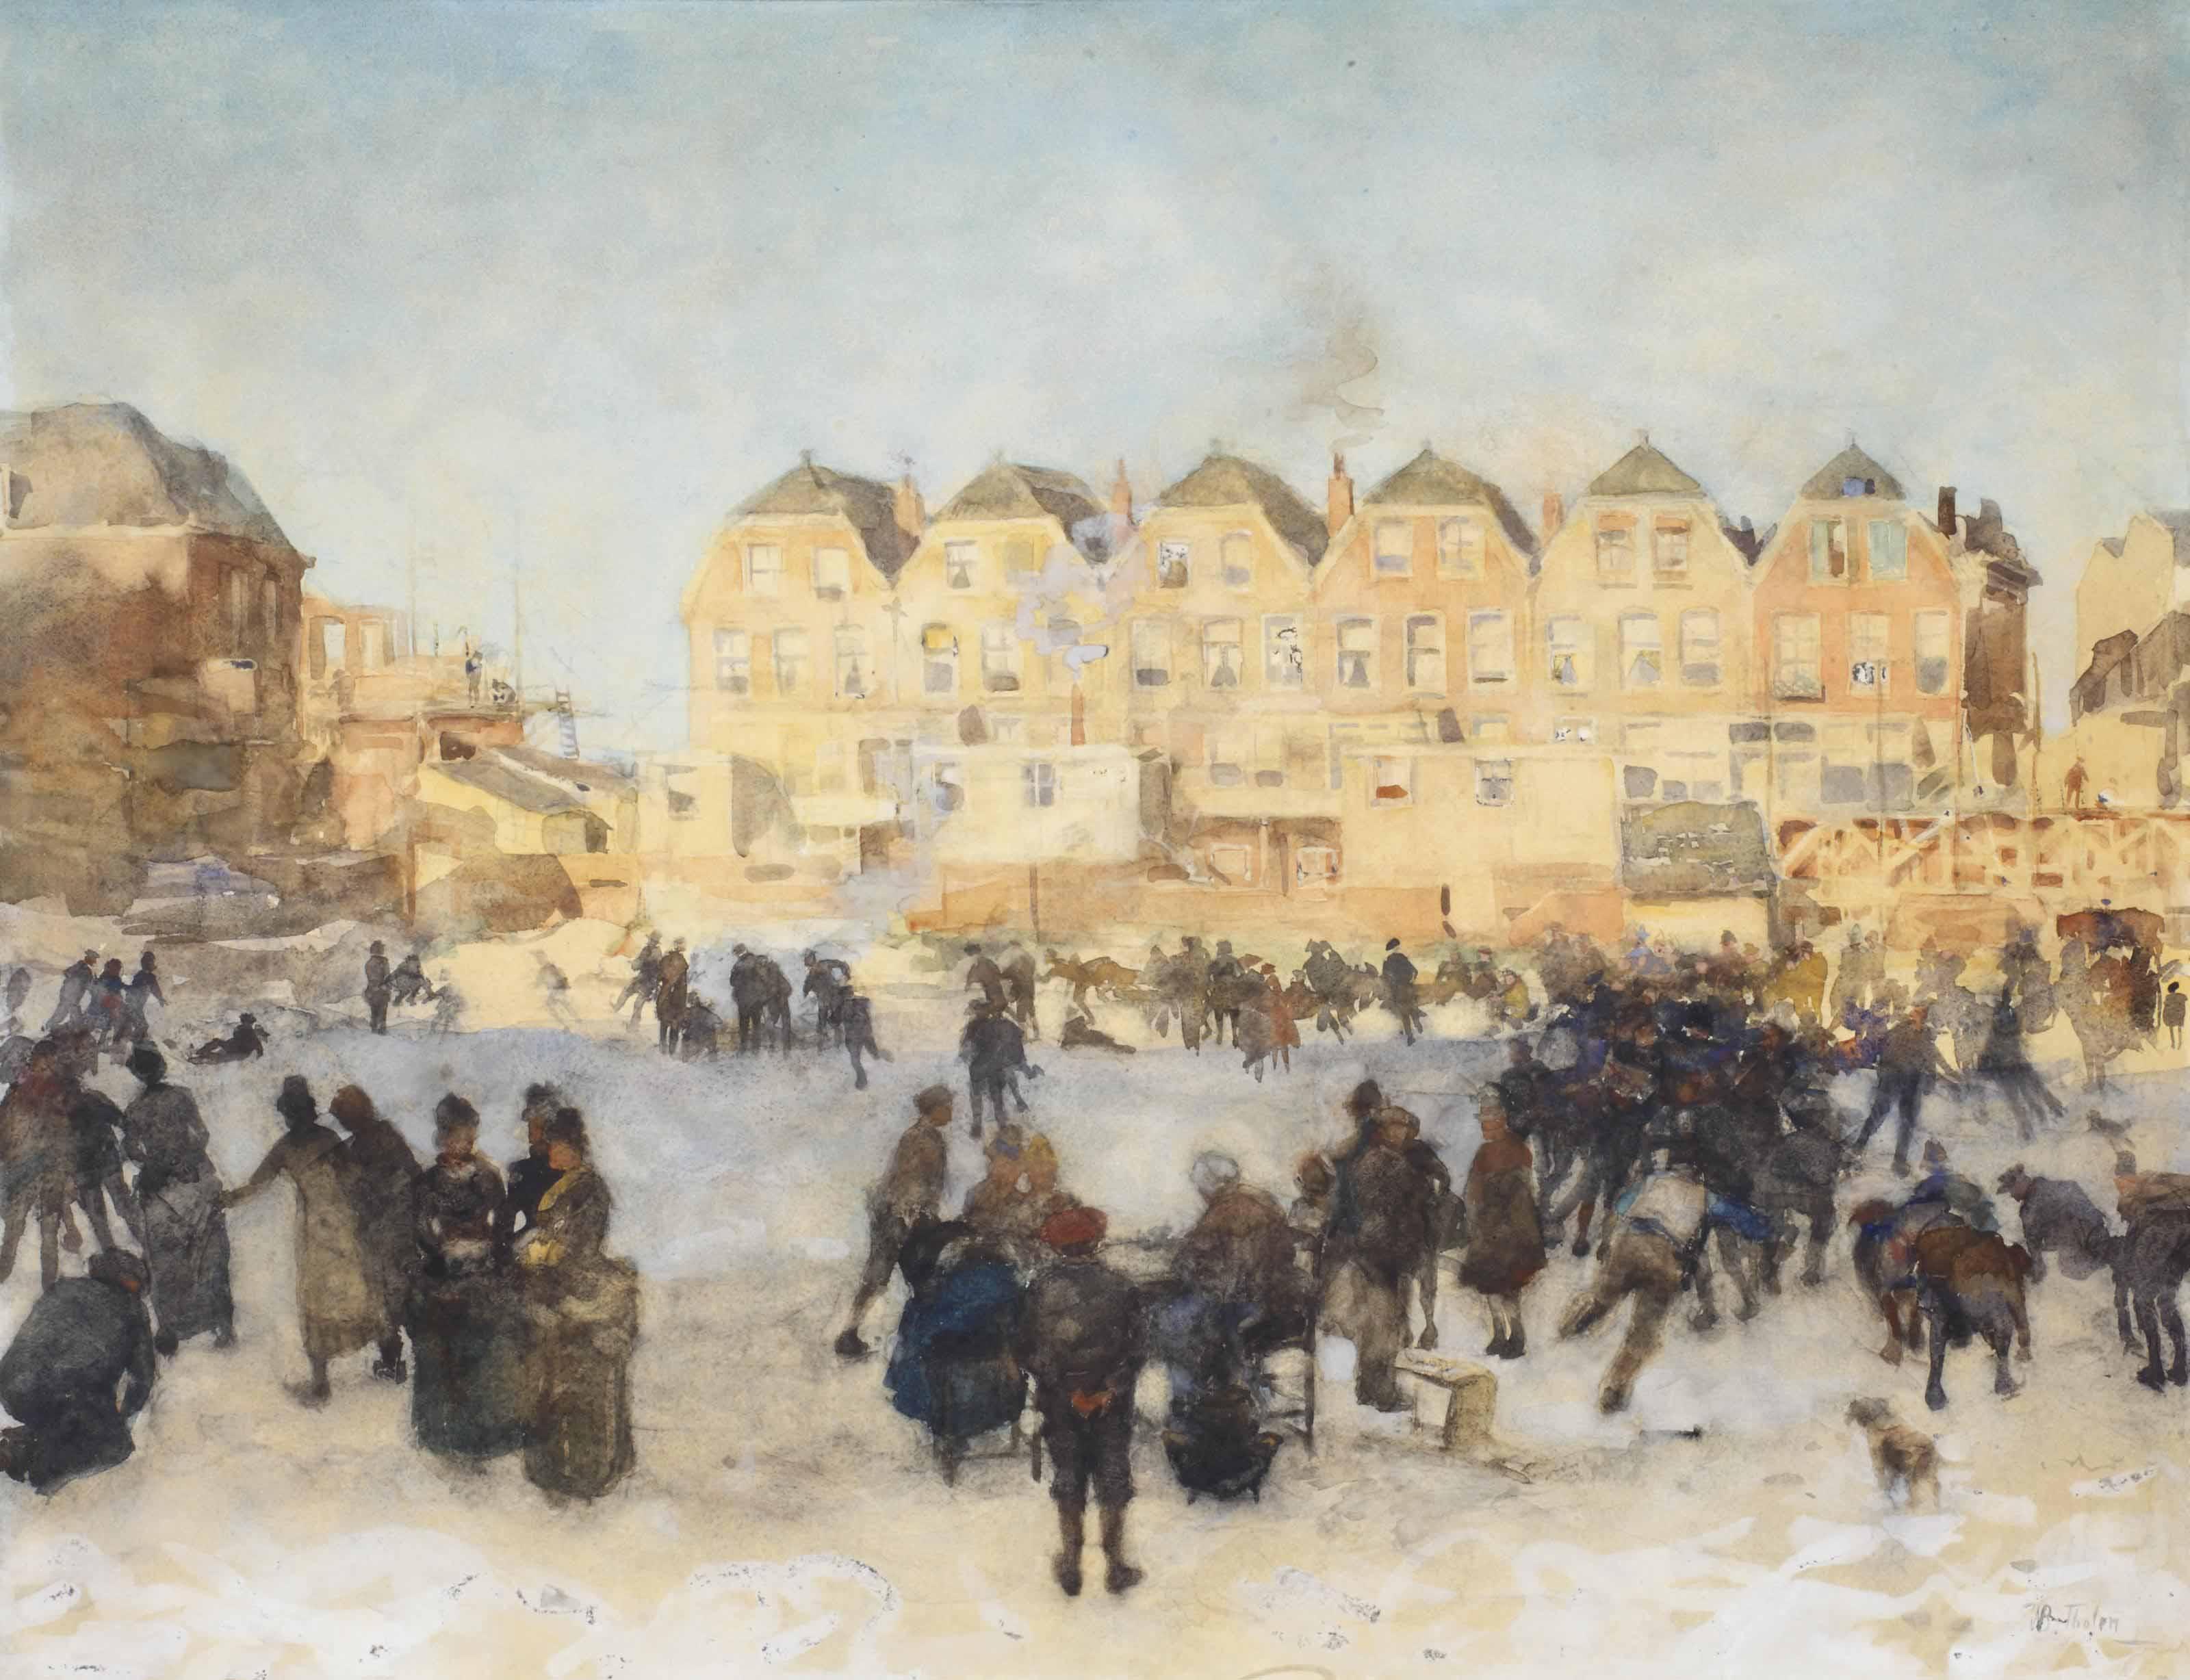 Winterfun on a sunny day, The Hague